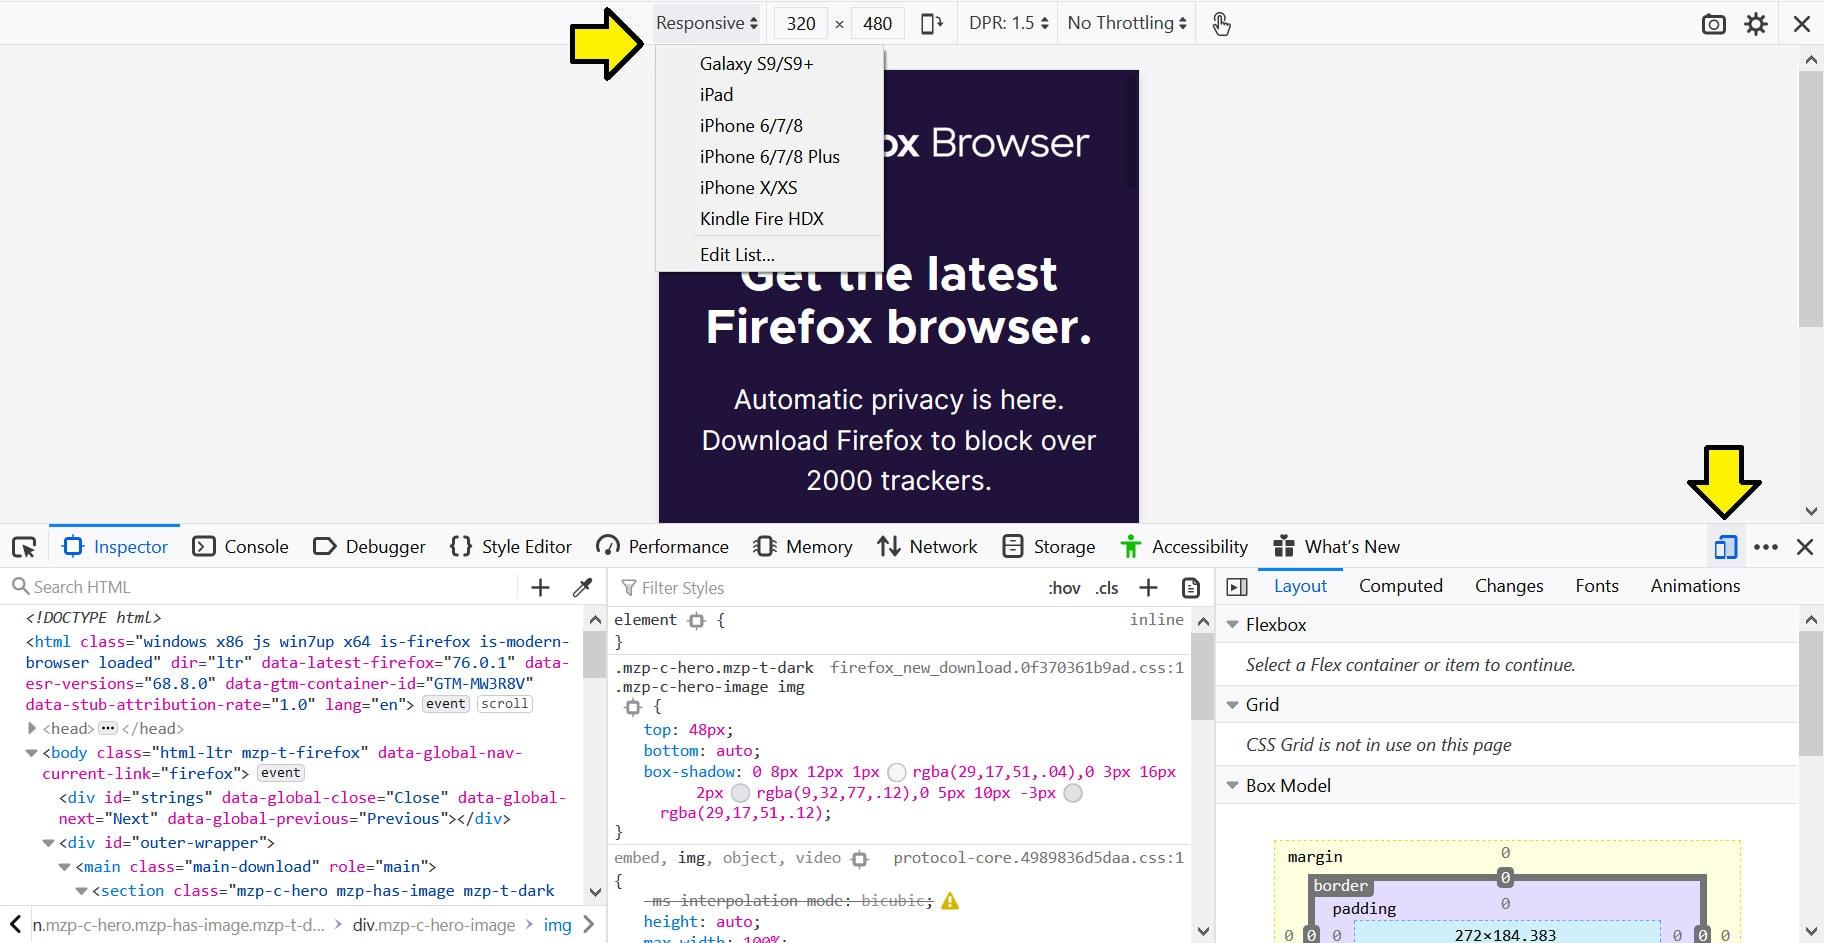 Firefox screen size